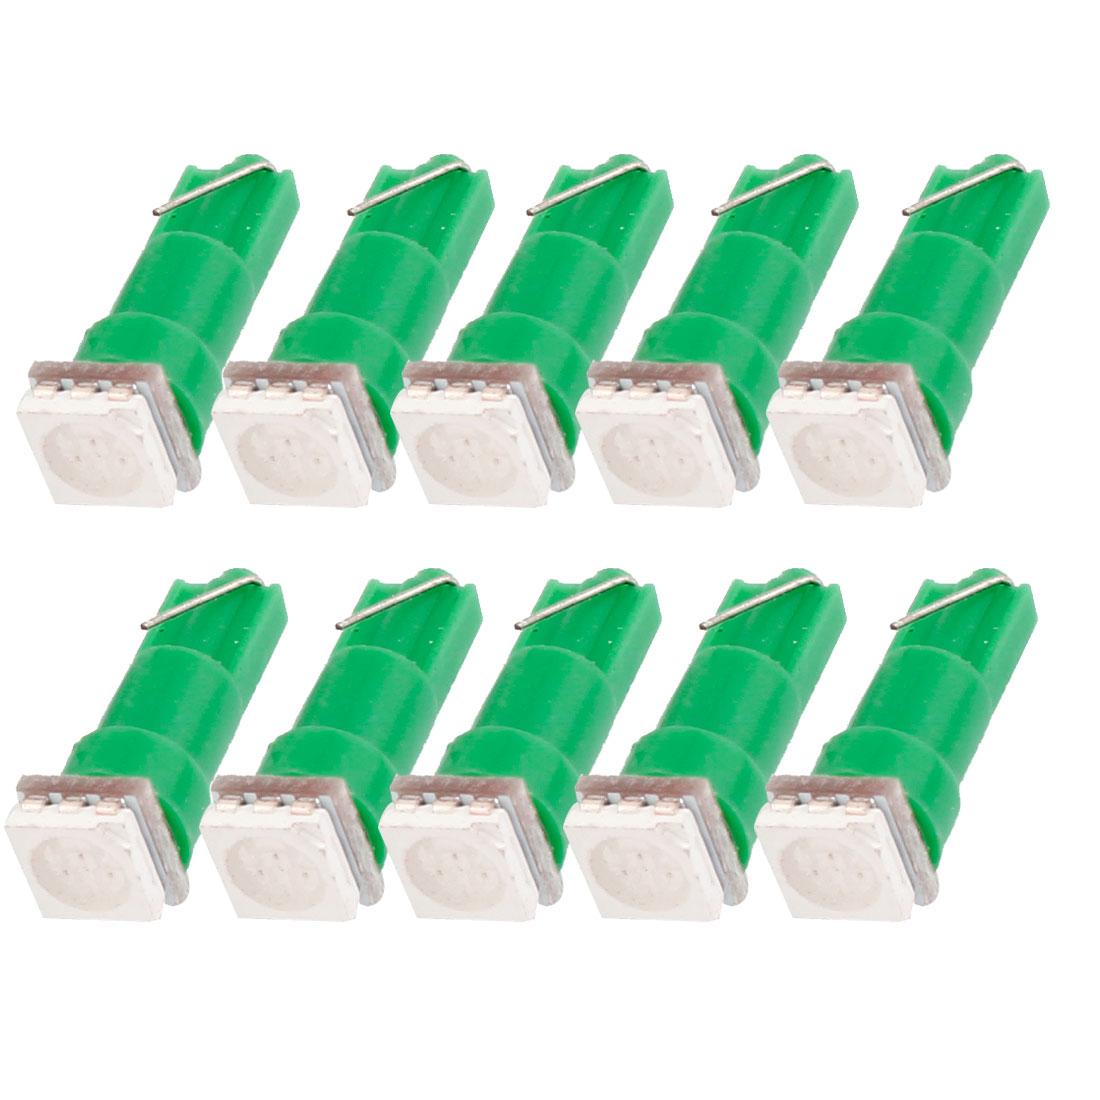 10 Pcs Car T5 Wedge Base 5050 SMD 1-LED Bulbs Dashboard Lights Lamps Green